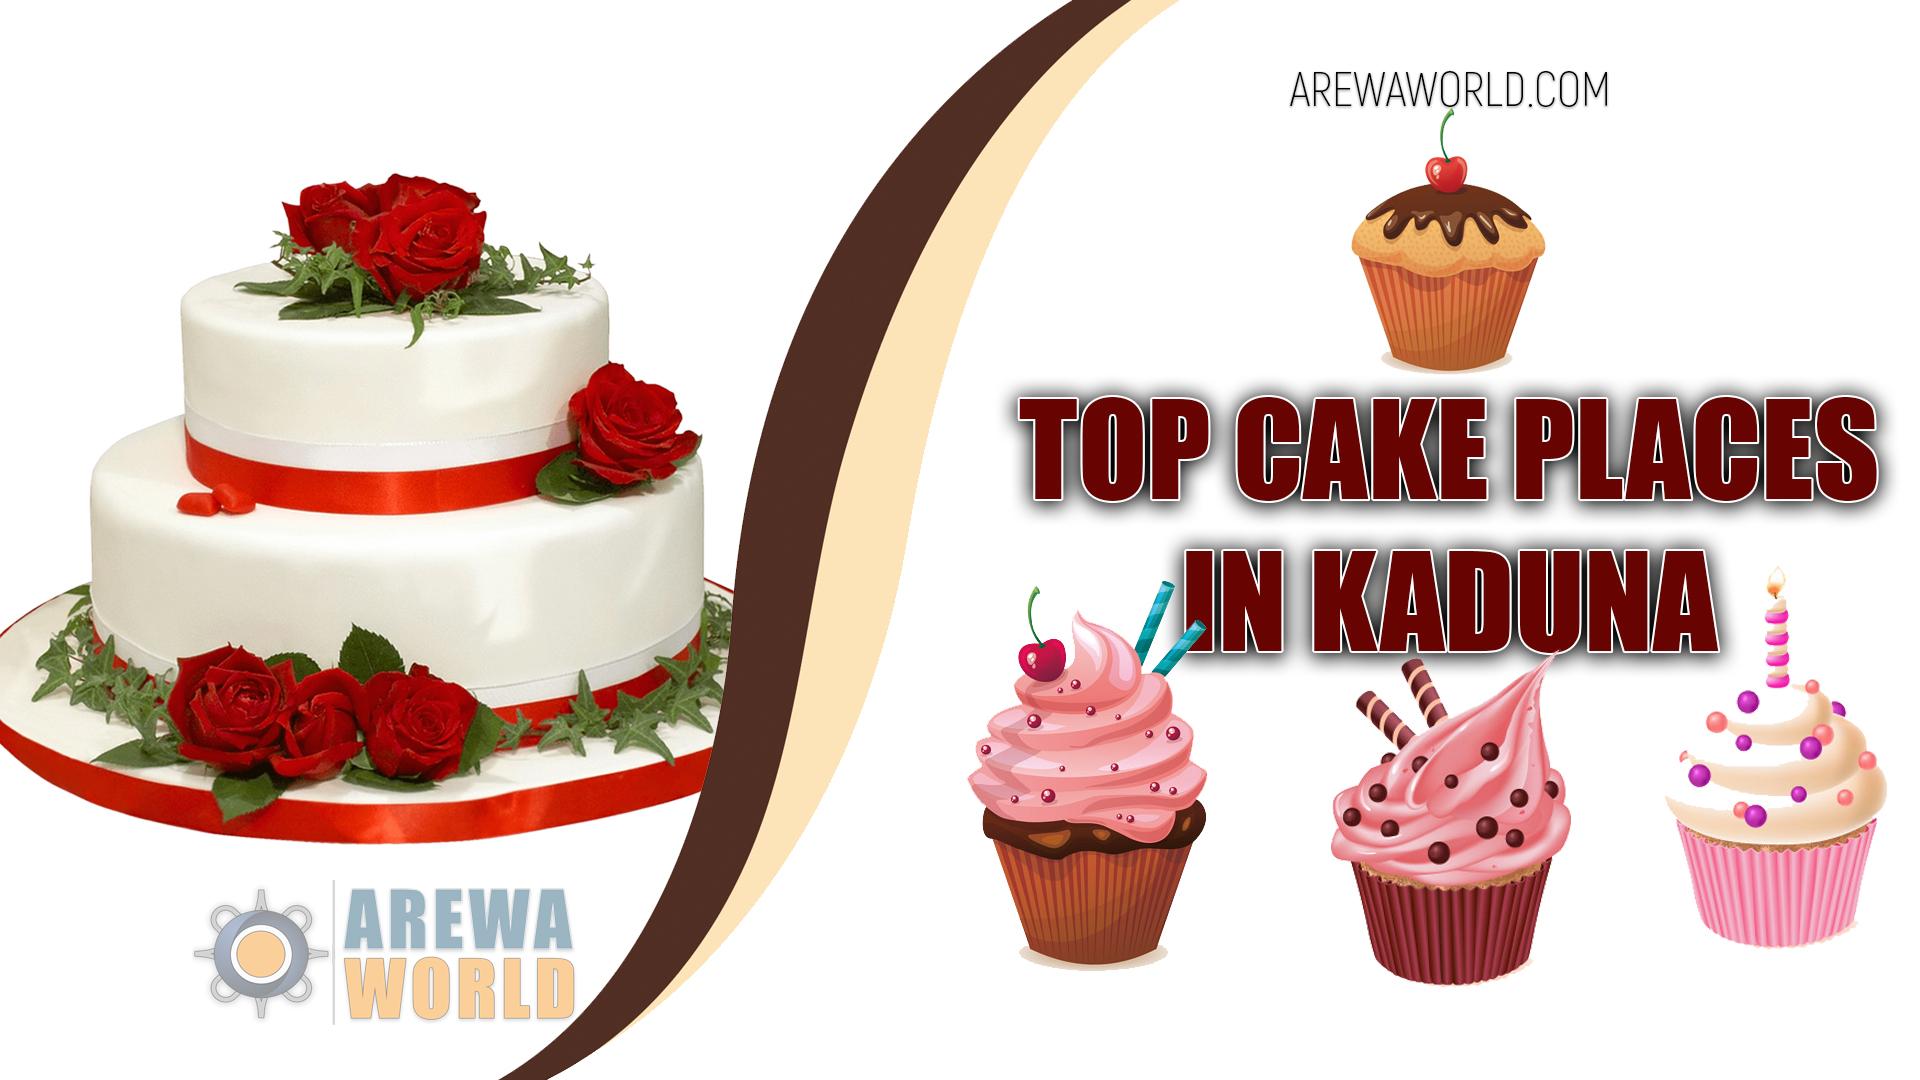 10 Bakers in Kaduna, Nigeria